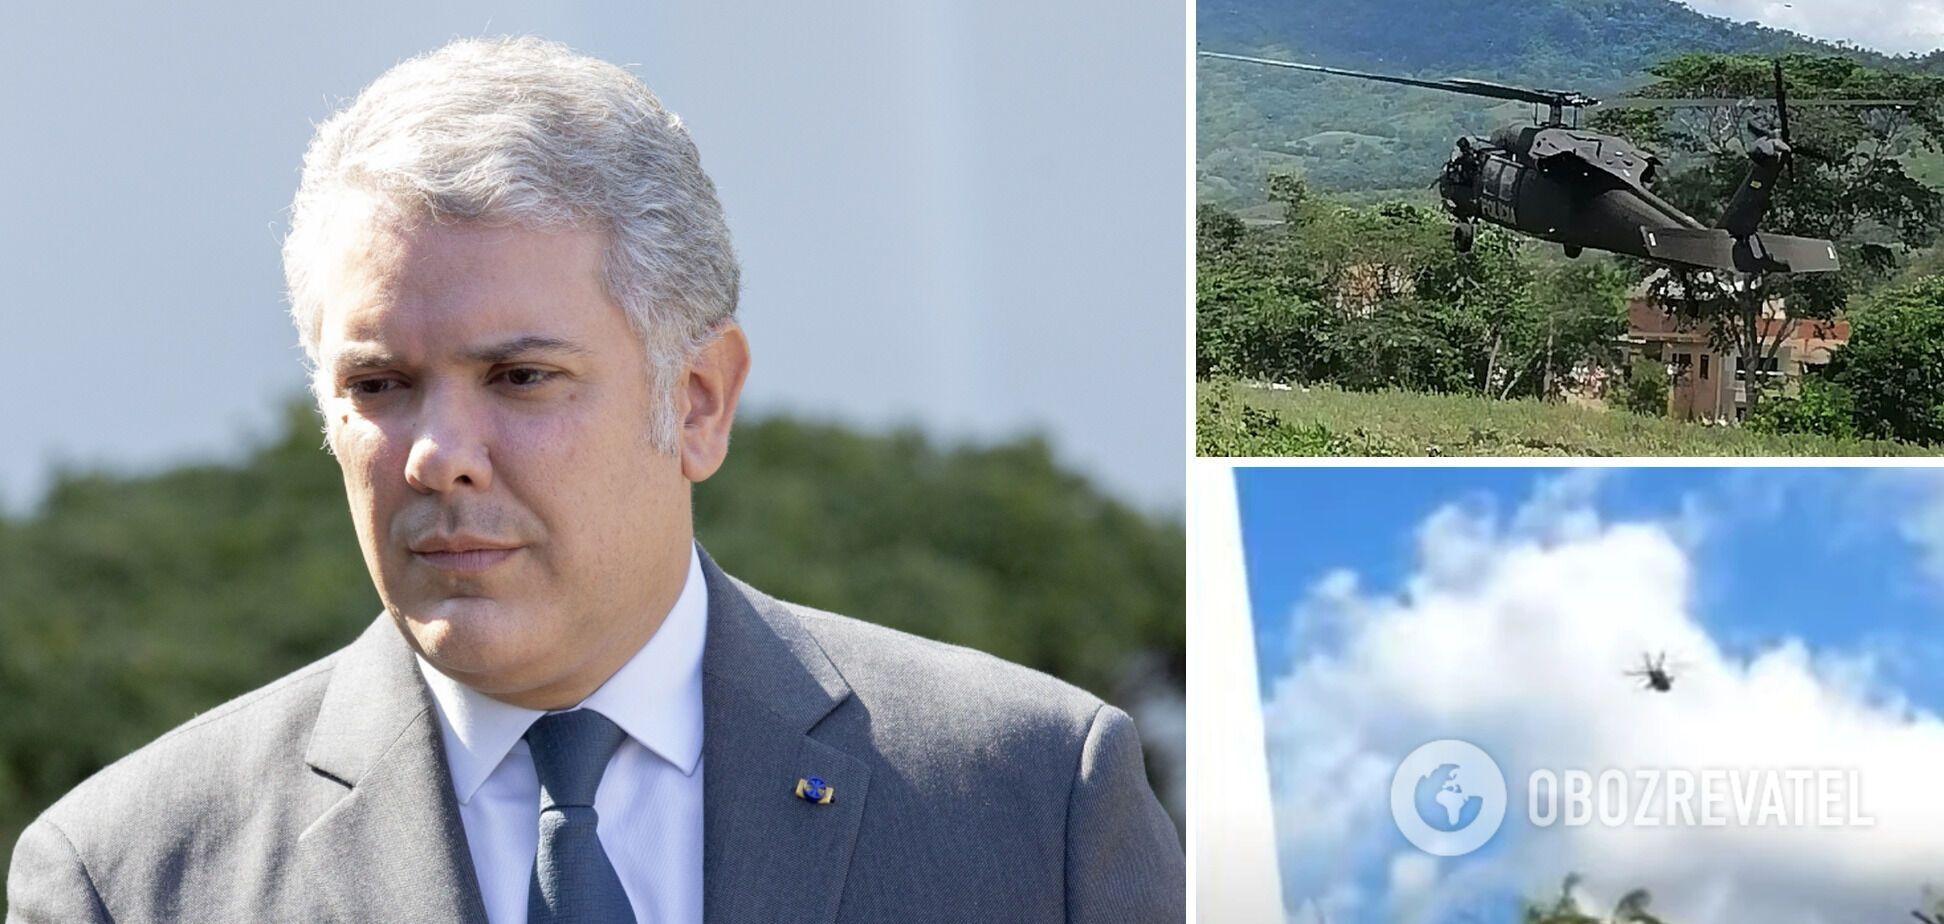 В Колумбии обстреляли вертолет с президентом на борту. Момент попал на видео